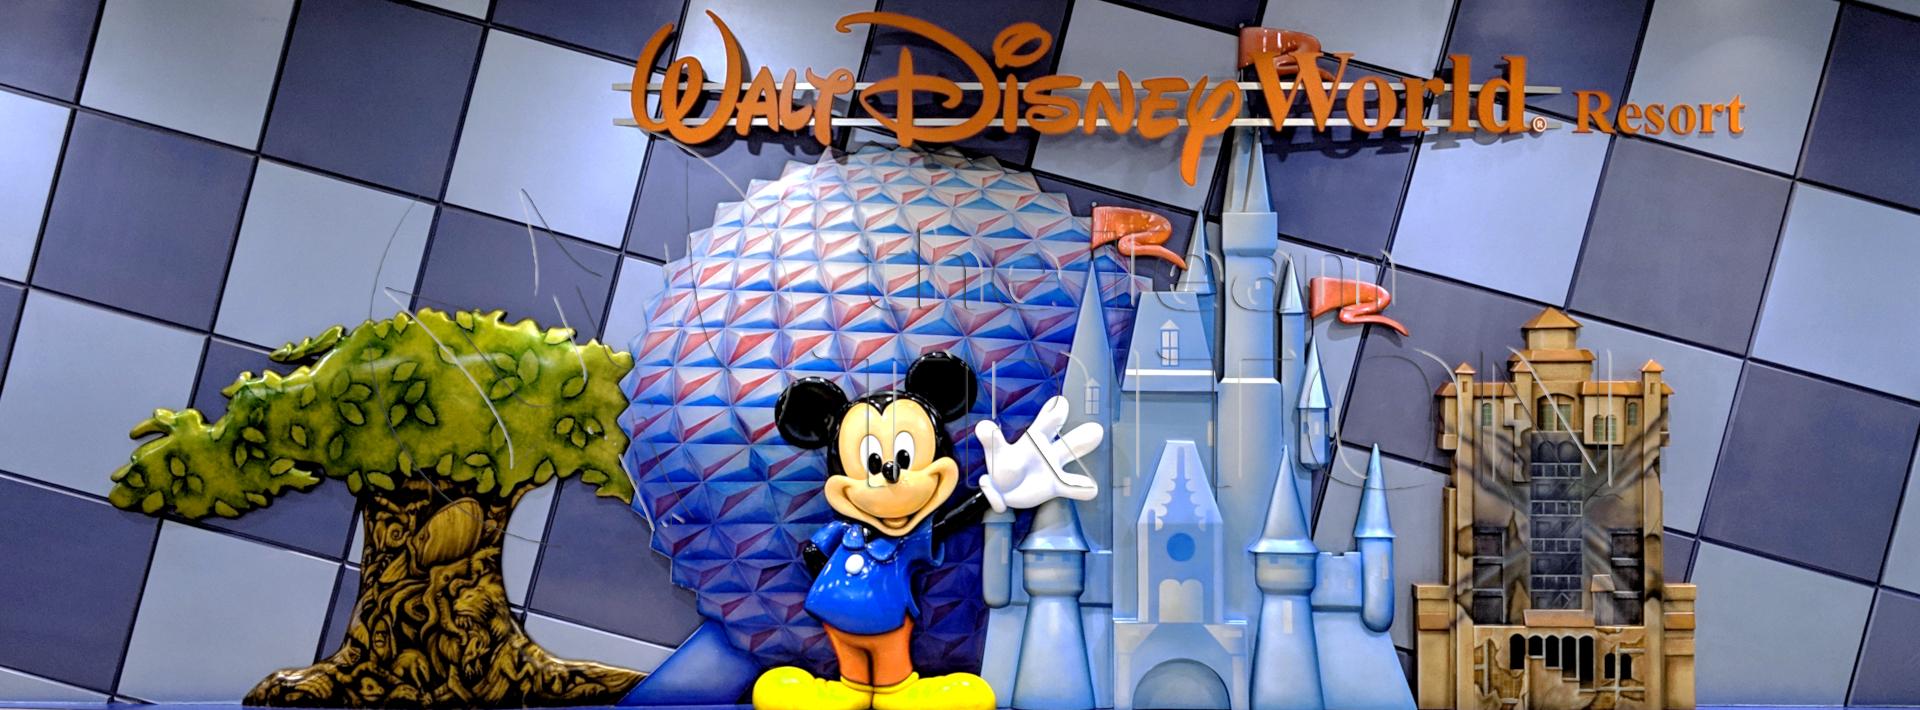 MCO-Disney-Merchandise-3D-signe-001